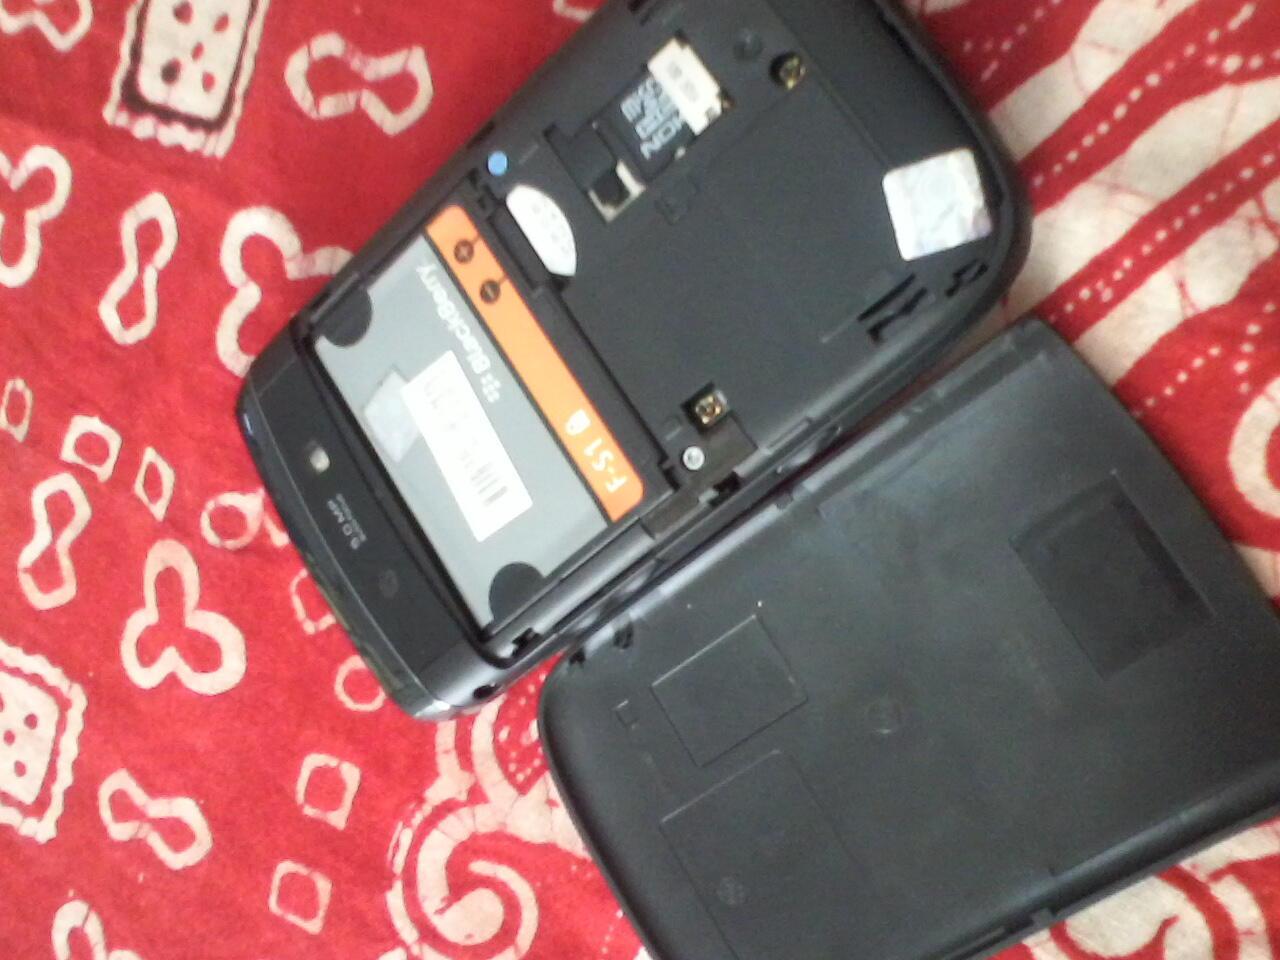 Dijual HP BB 9800 masih garansi Compaq